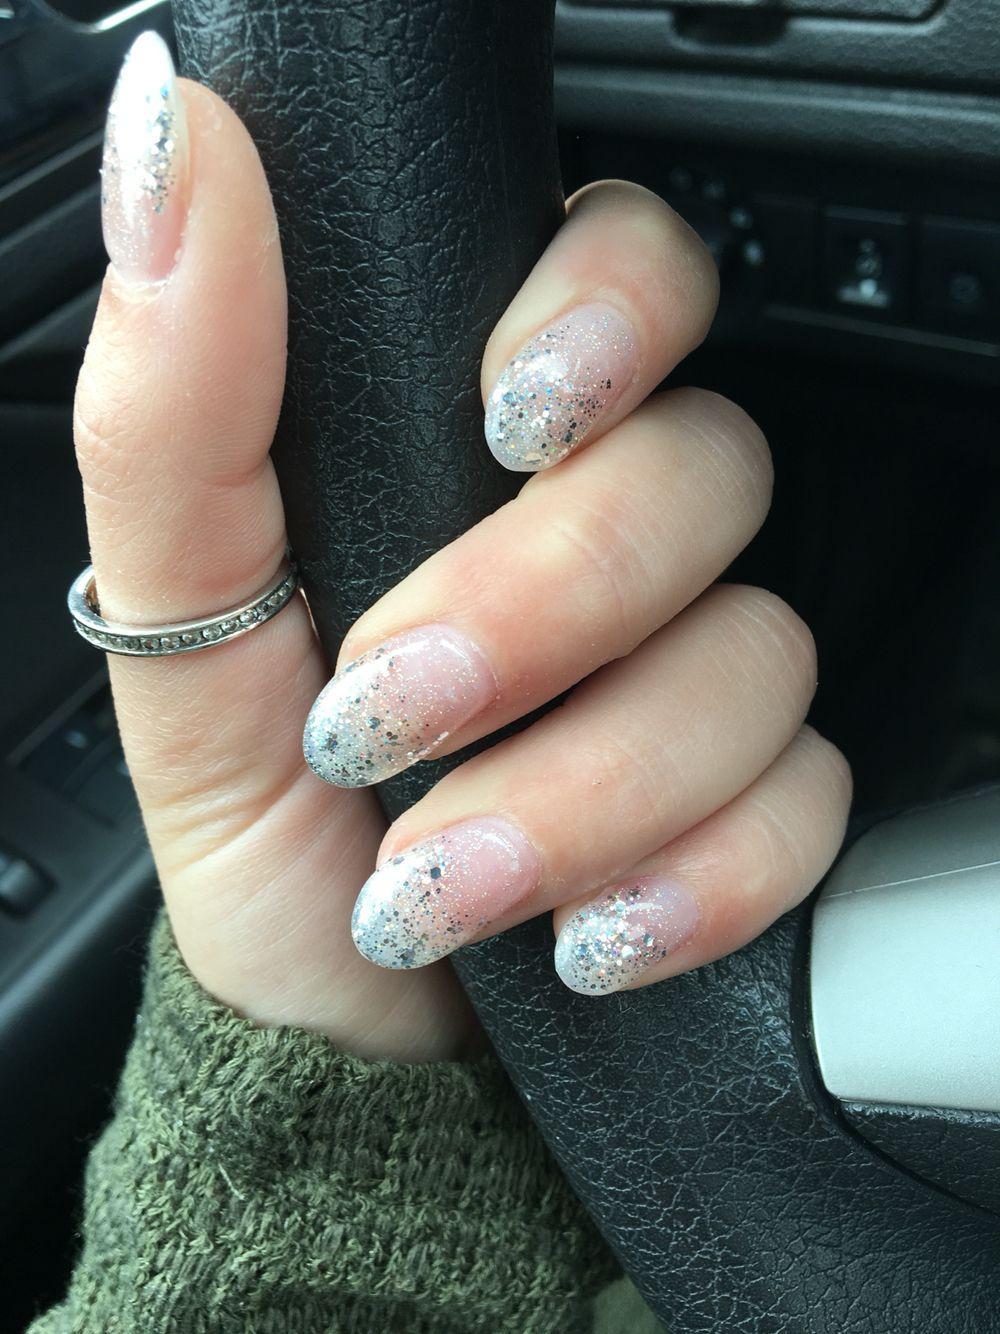 Round silver glitter acrylic nails | Nails! | Pinterest | Glitter ...